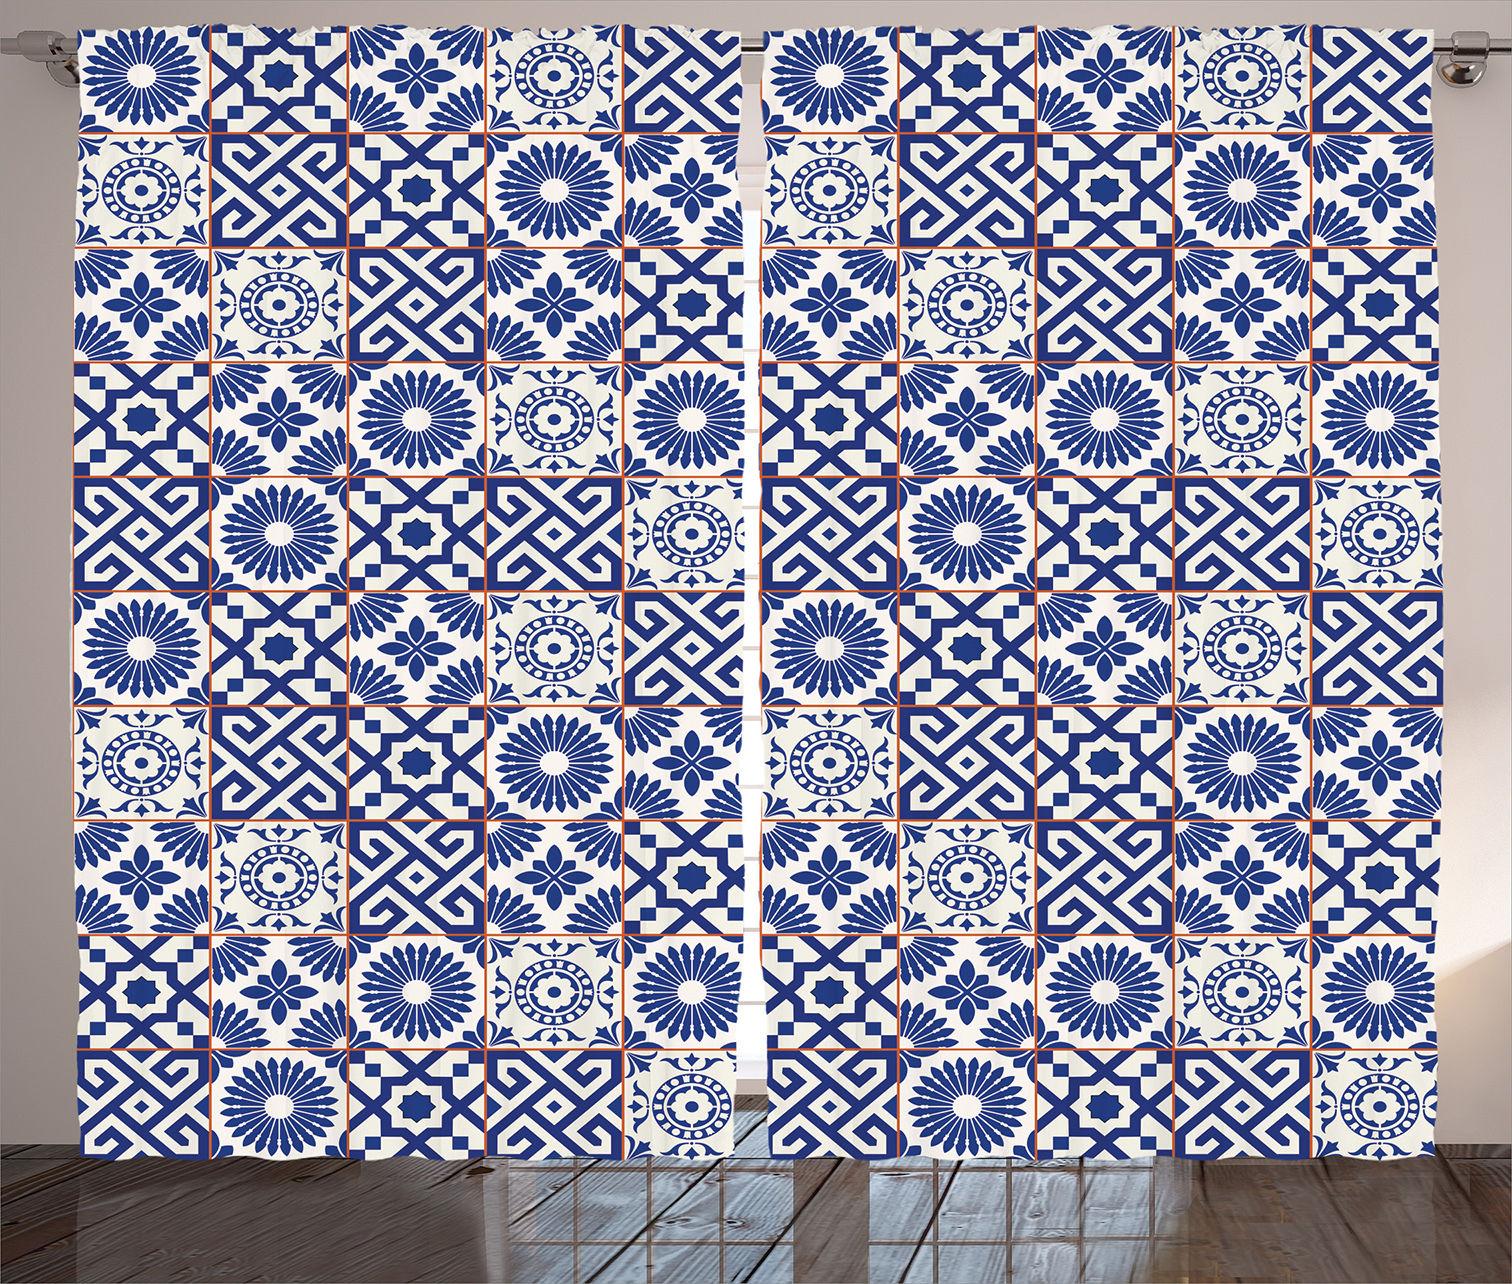 Moroccan Mosaic Tiles Pattern Folk Art Style Modern Print Curtain 2 Panels Set